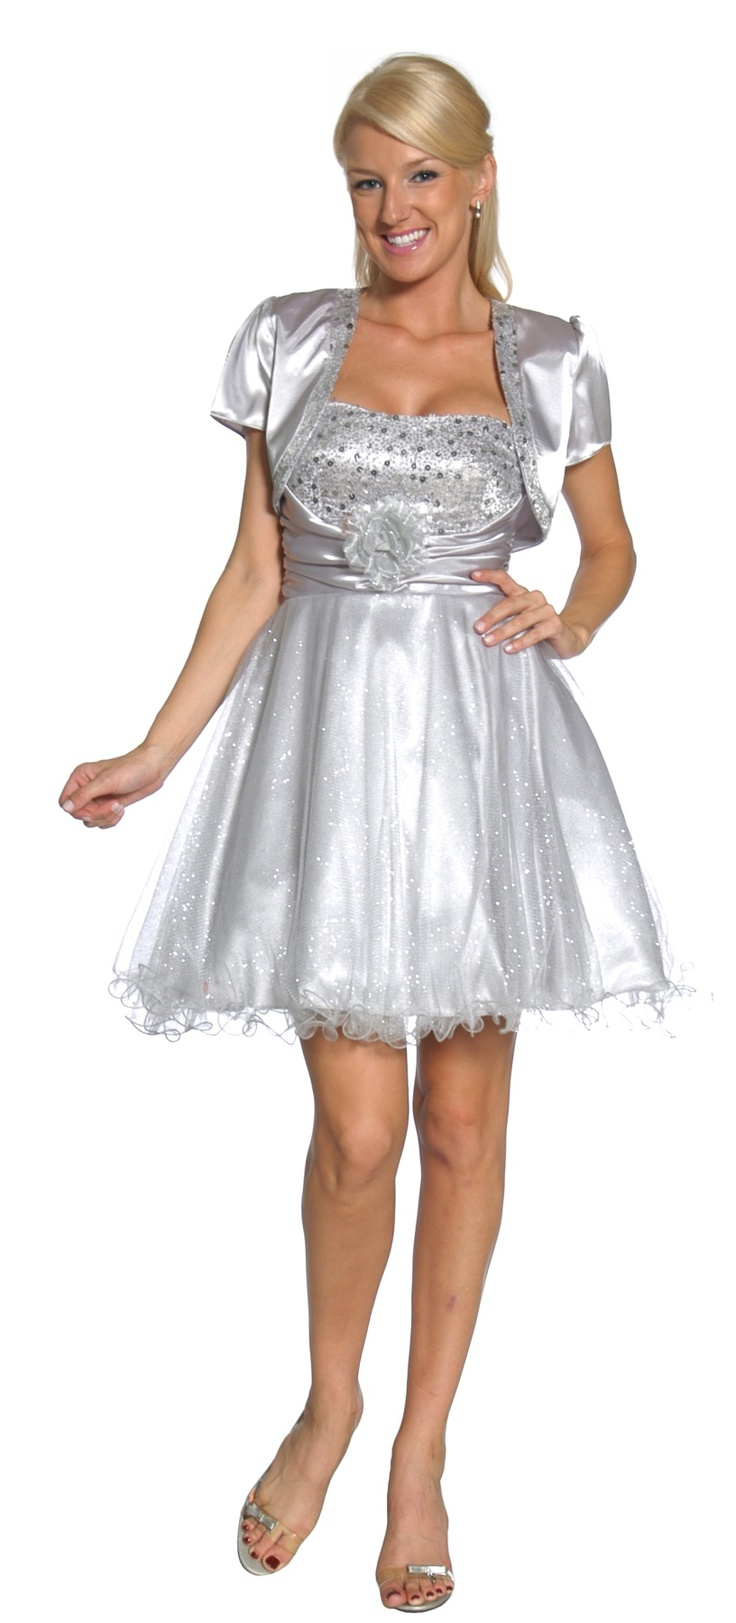 Strapless Dress with Boleros